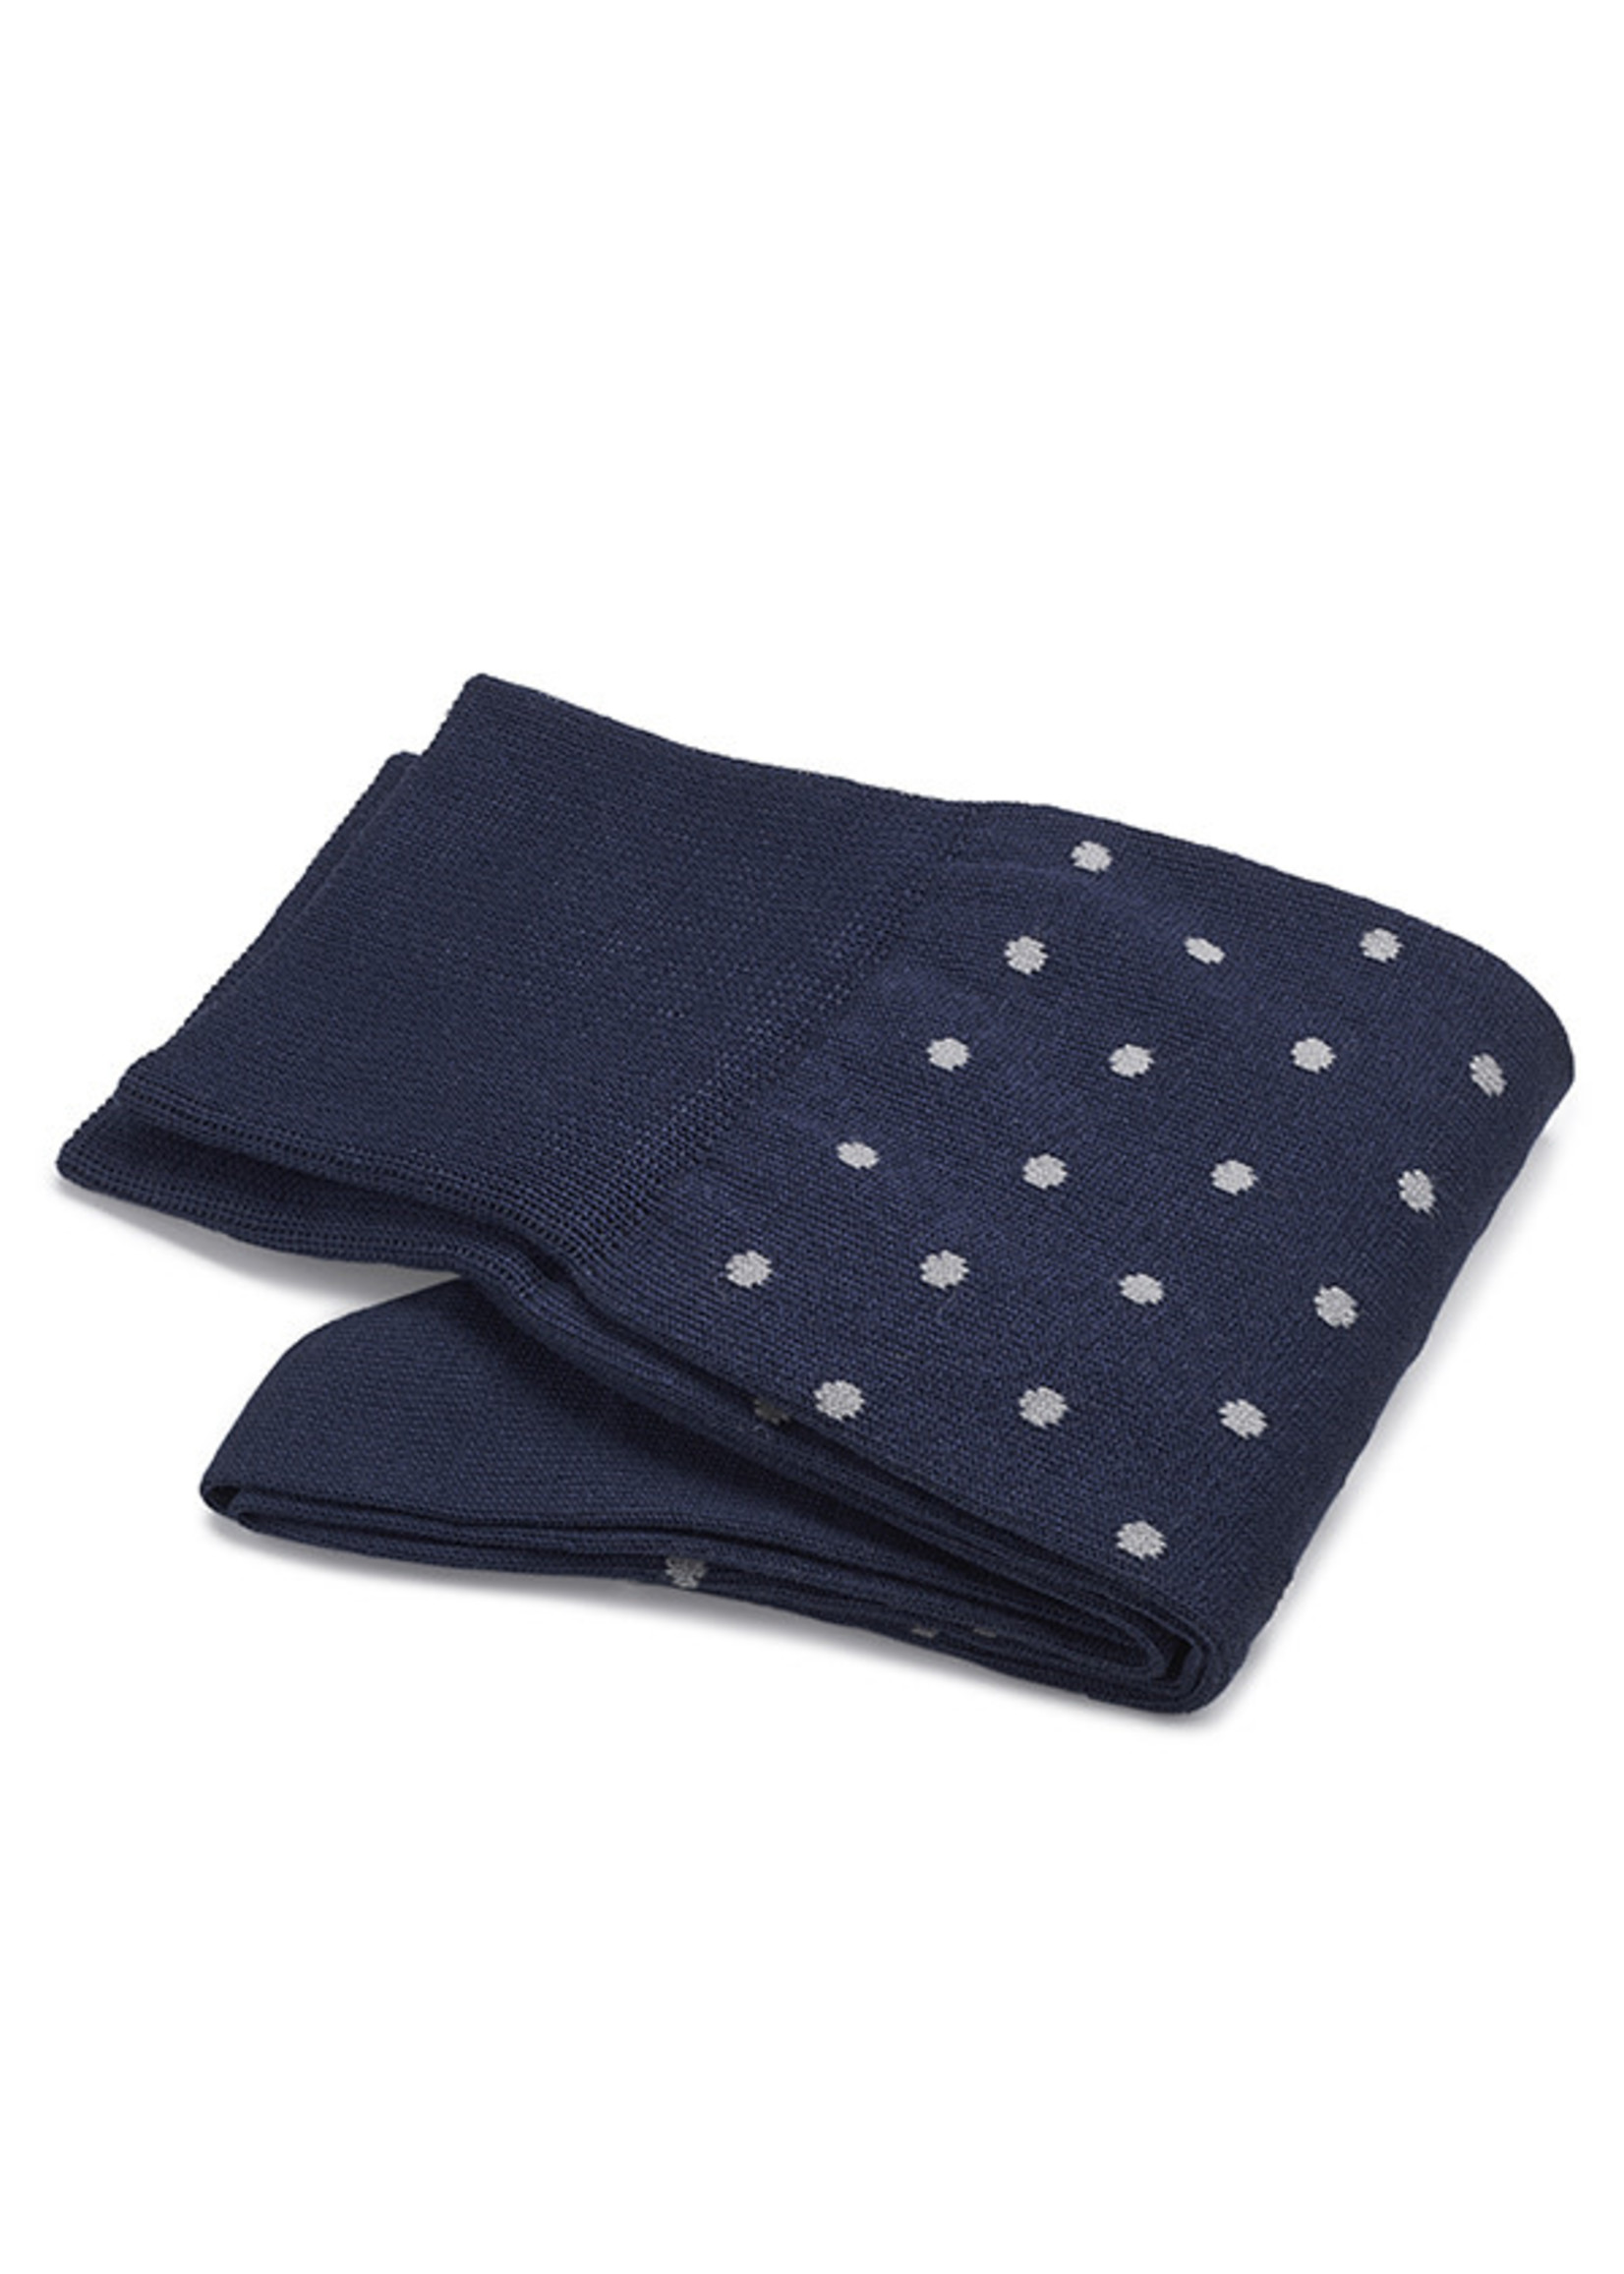 Carlo Lanza korte sokken katoen royalblauwe stip